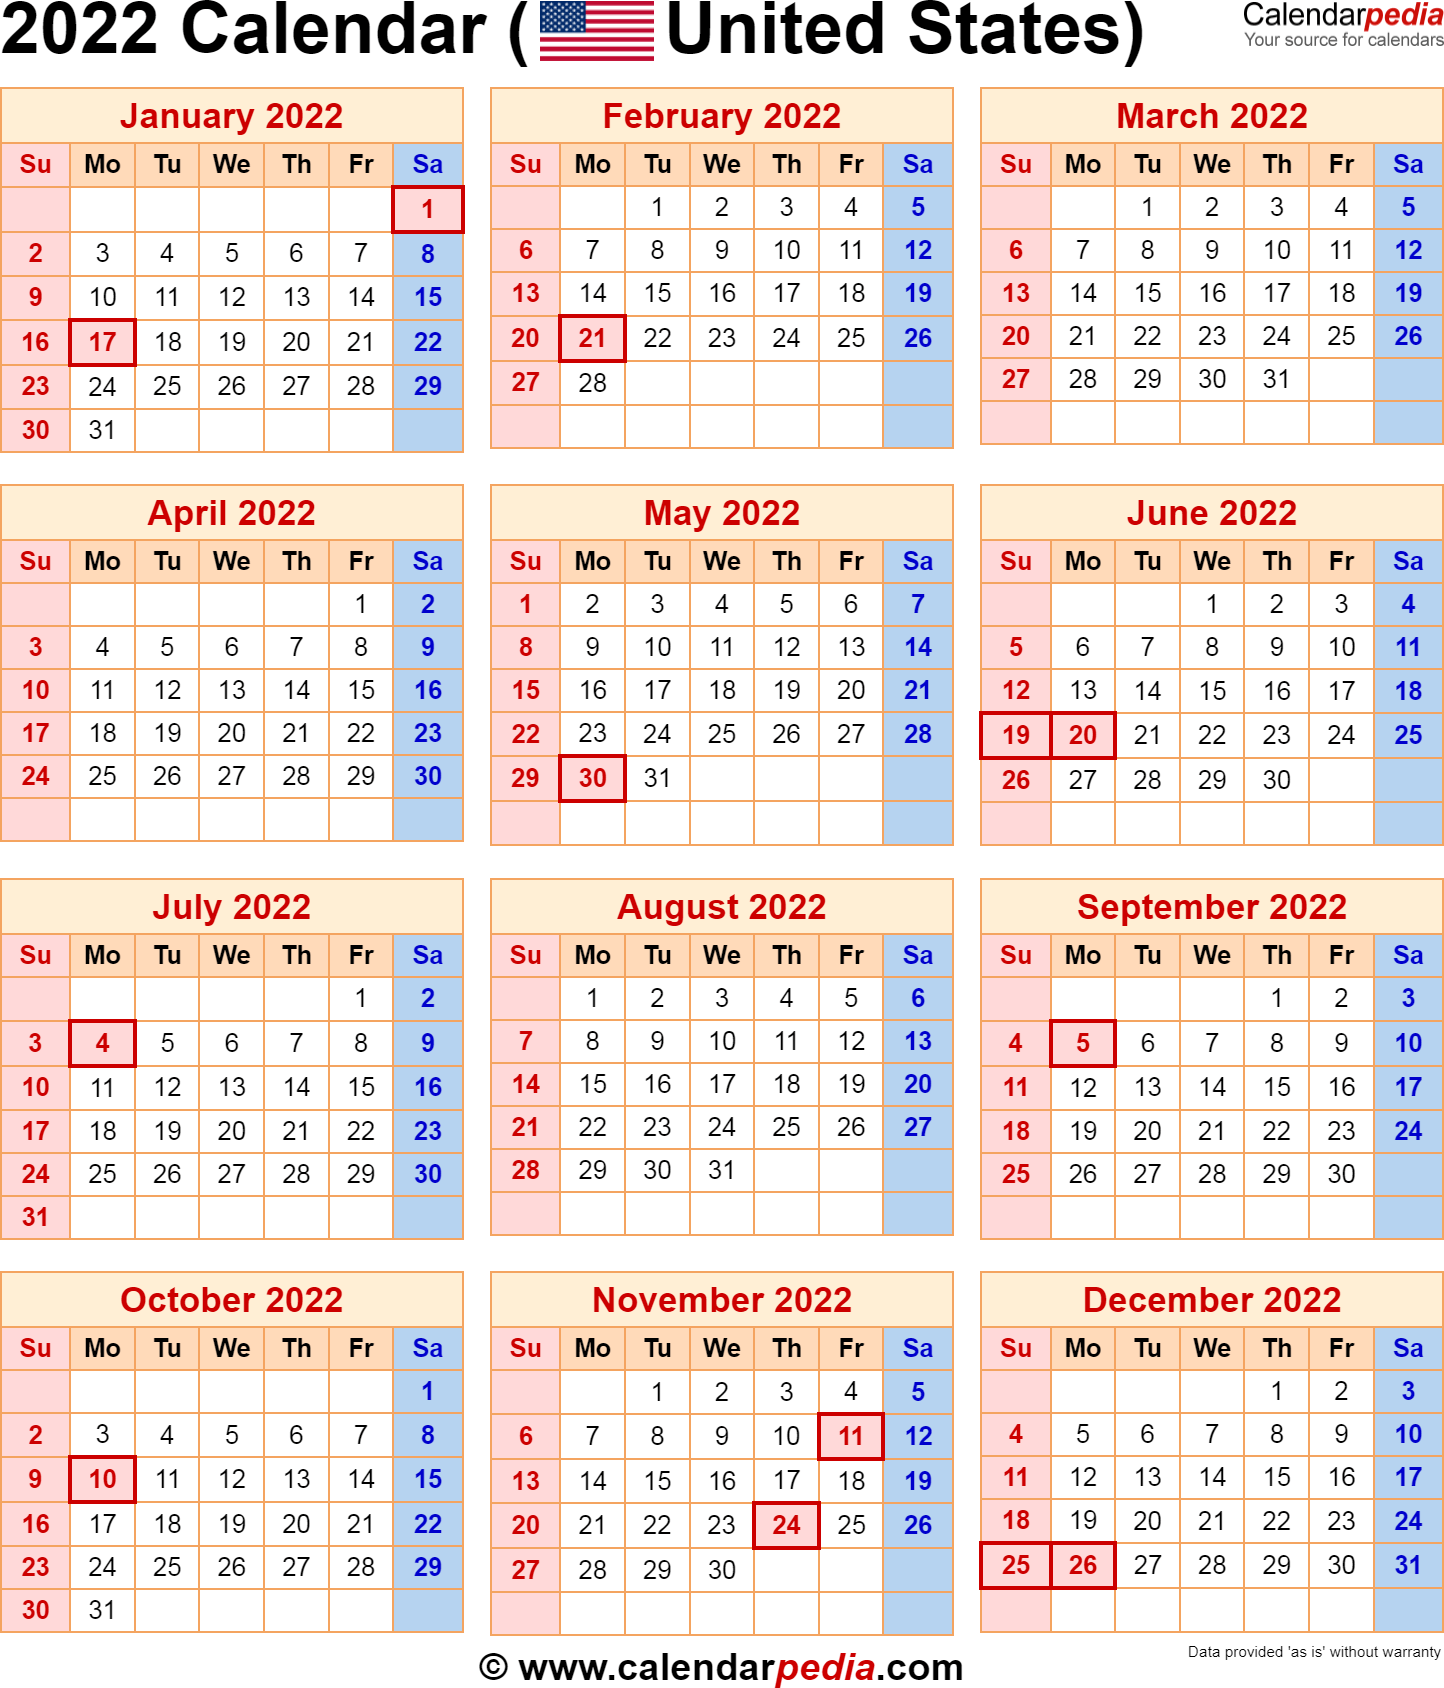 Miami University Calendar 2022 23.2022 Calendar With Federal Holidays